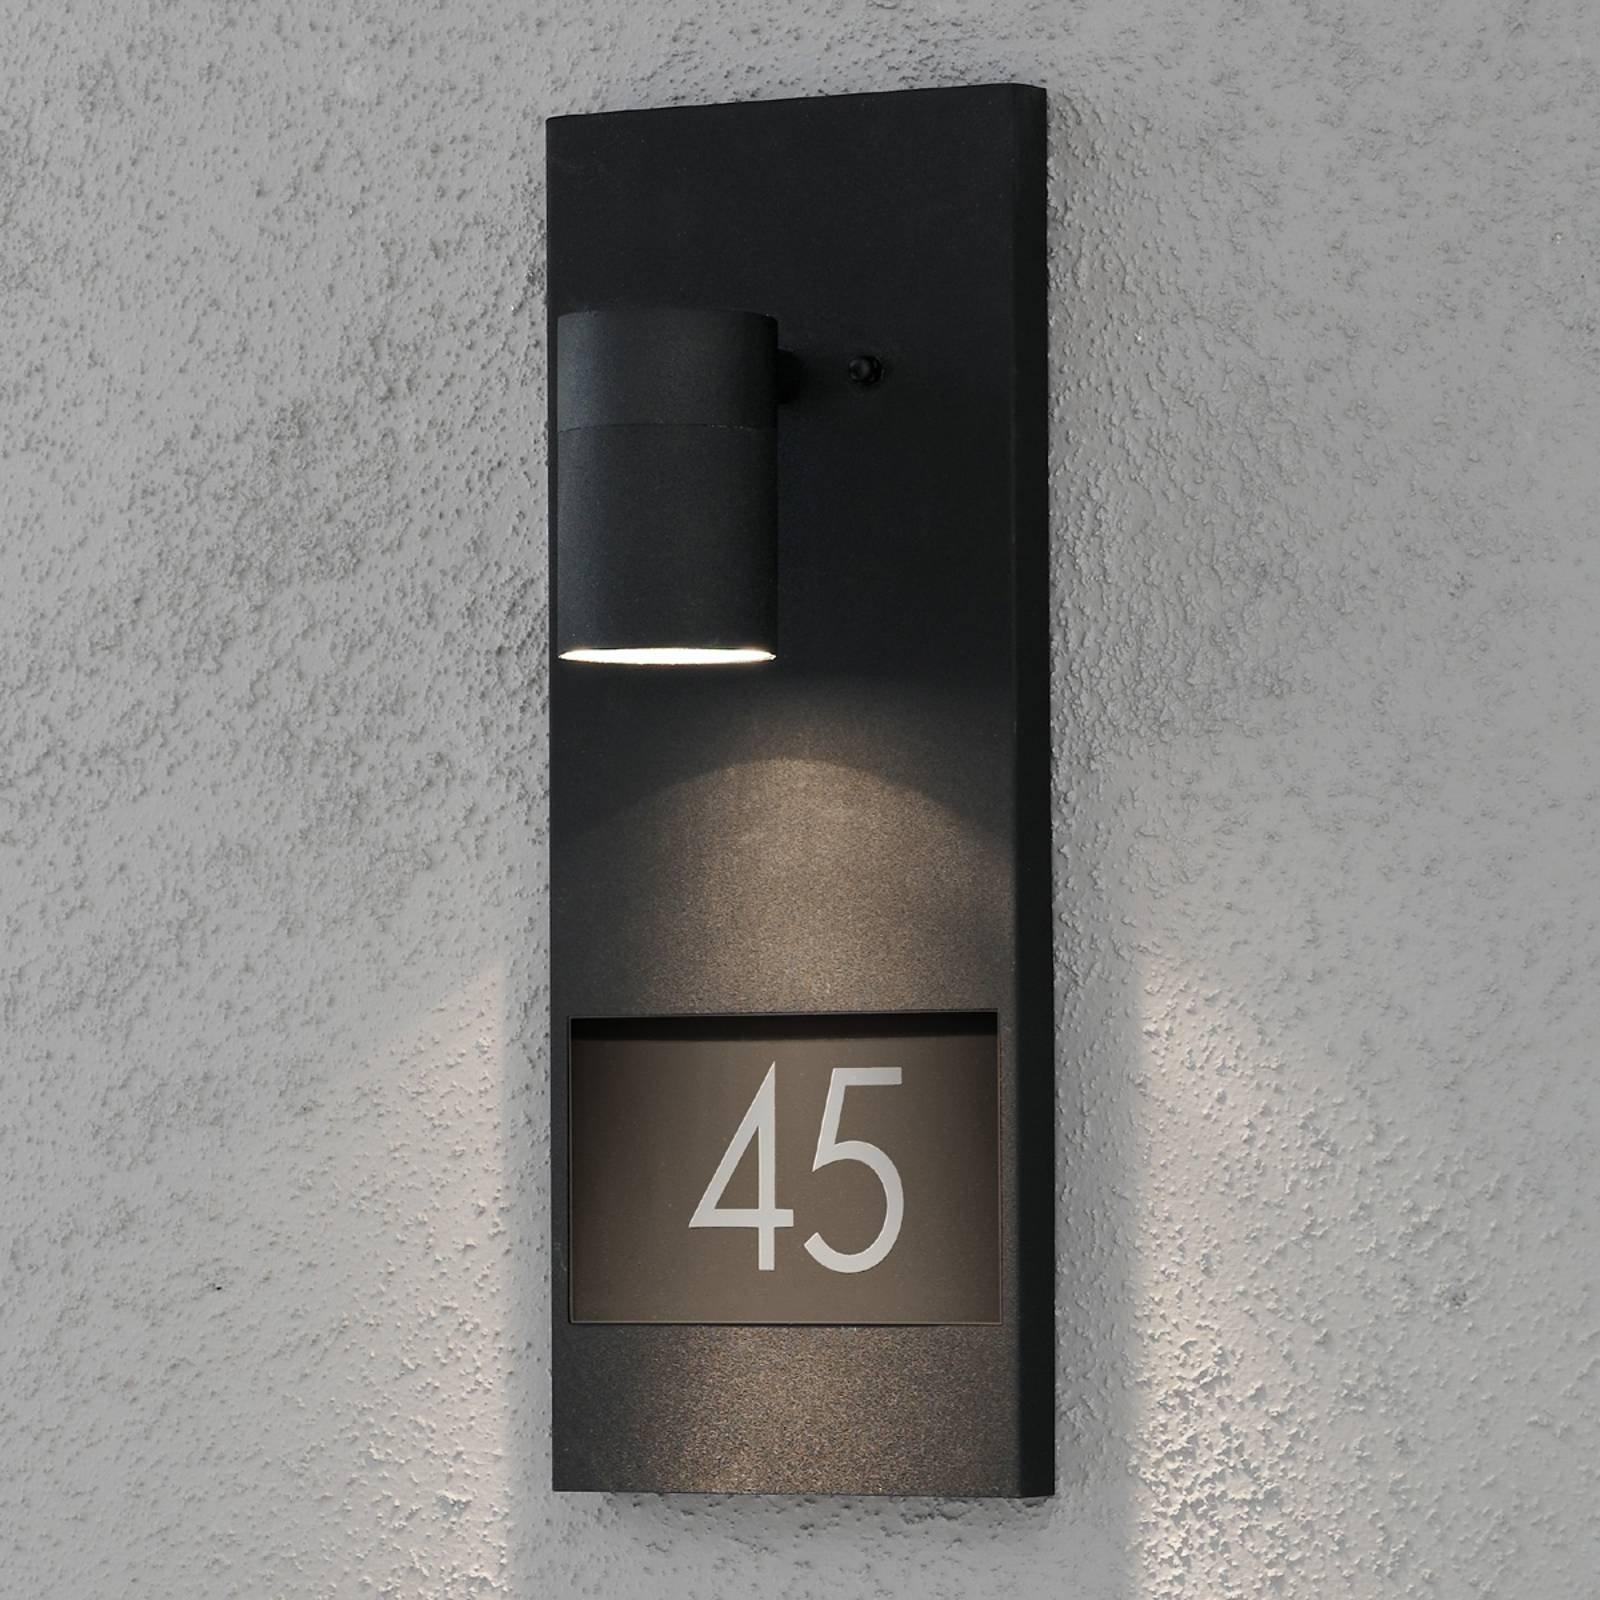 Flott husnummerlampe Modena 7655, svart